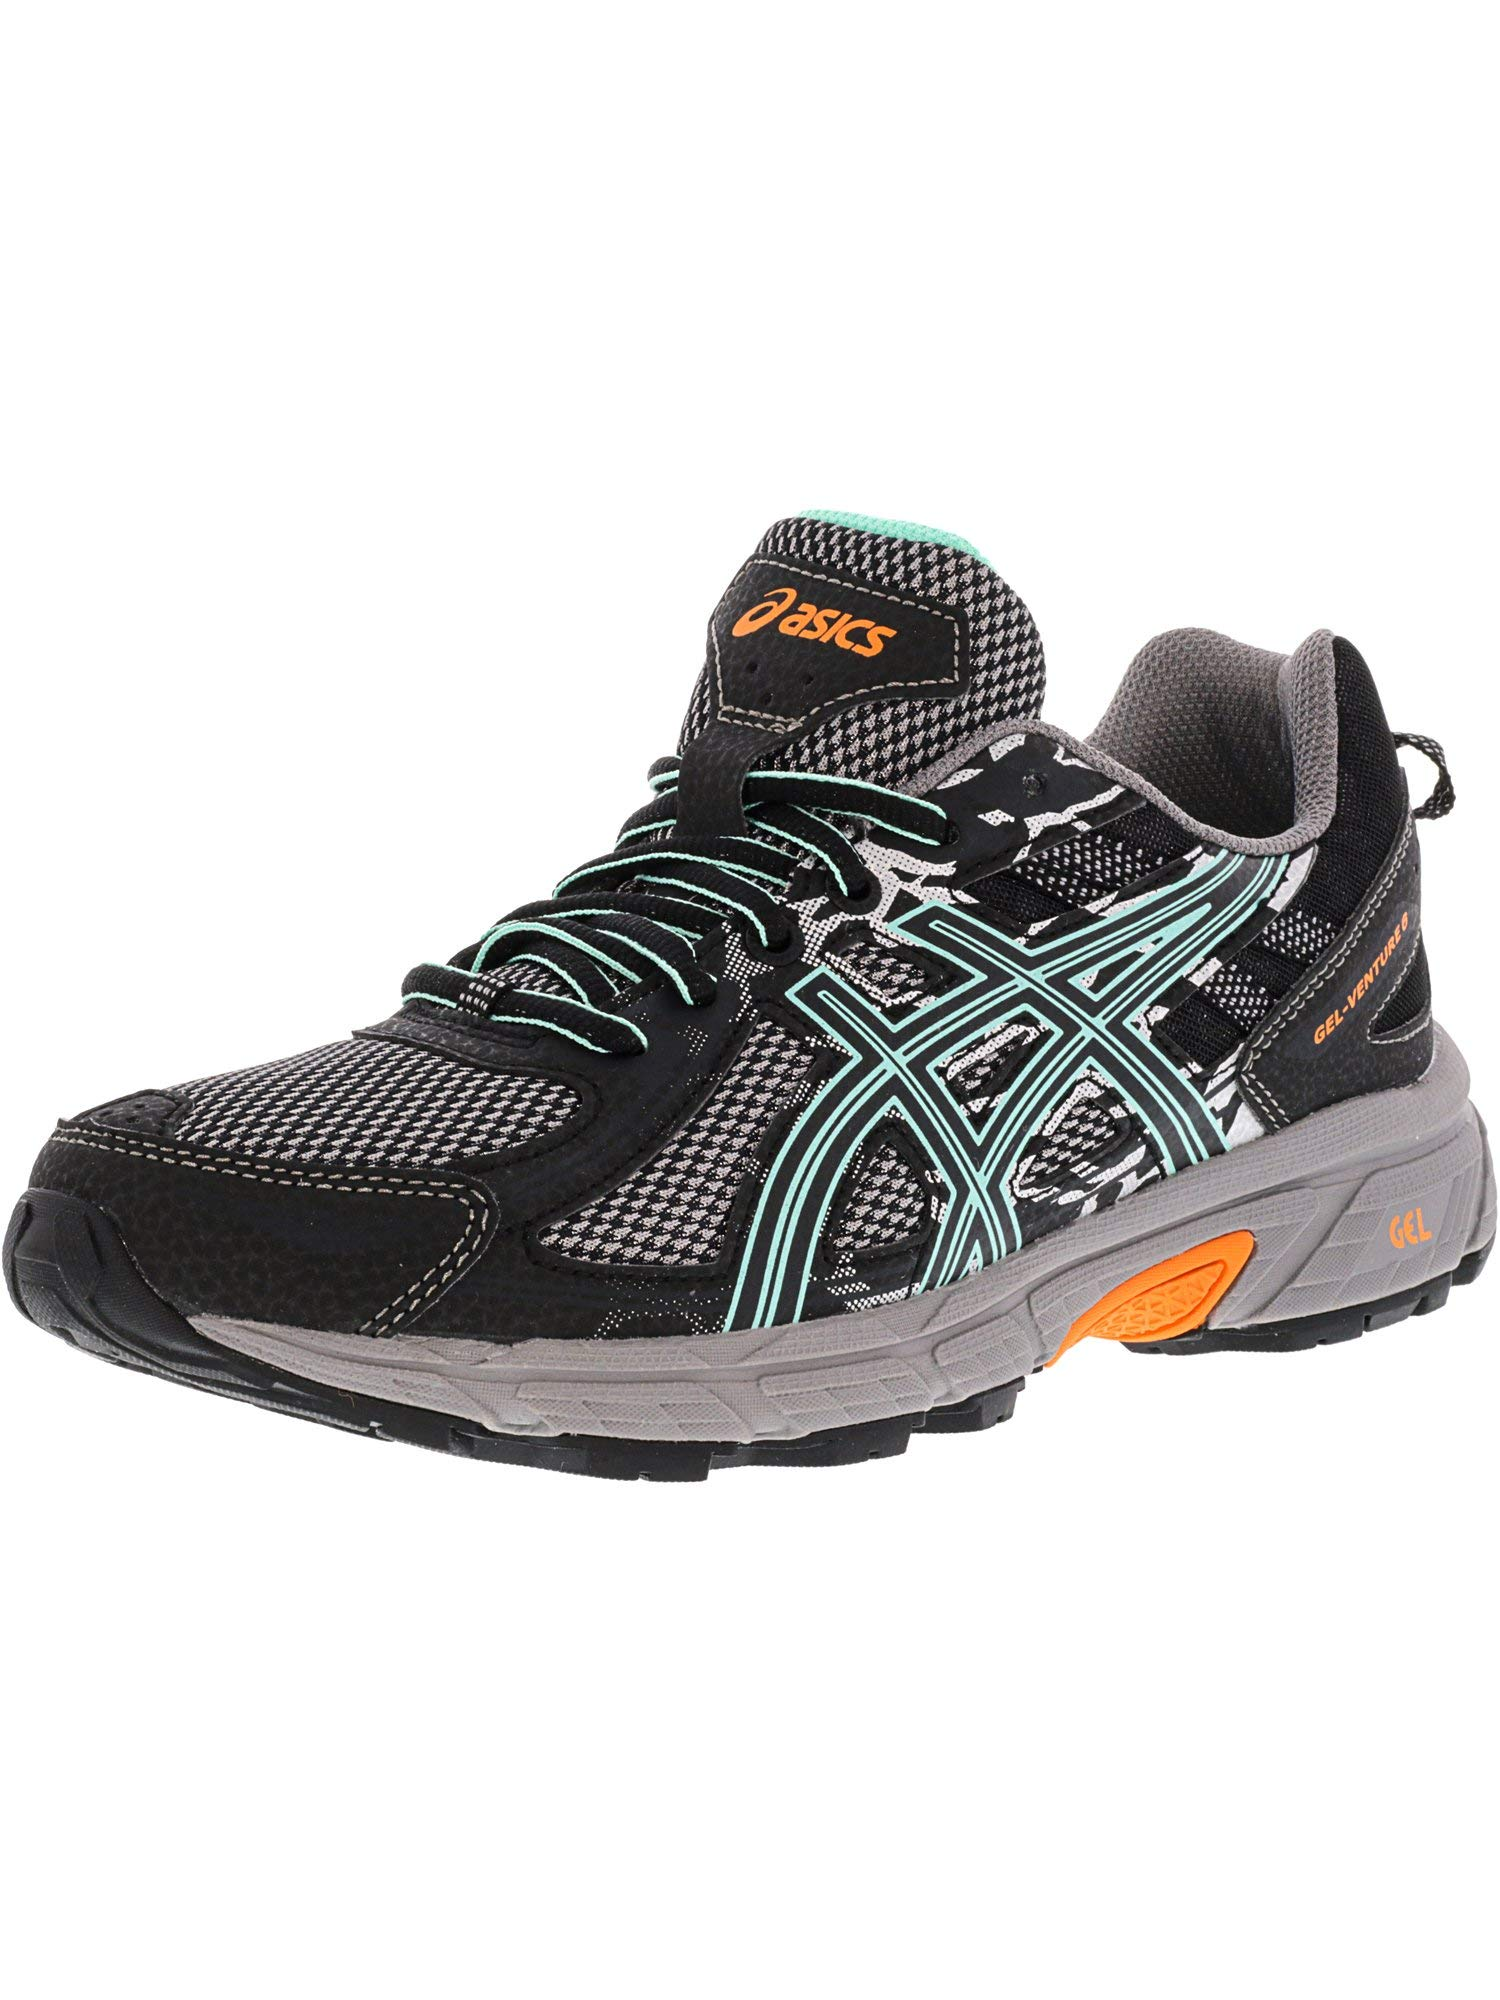 ASICS Womens Gel-Venture 6 Running Shoes Black/Ice